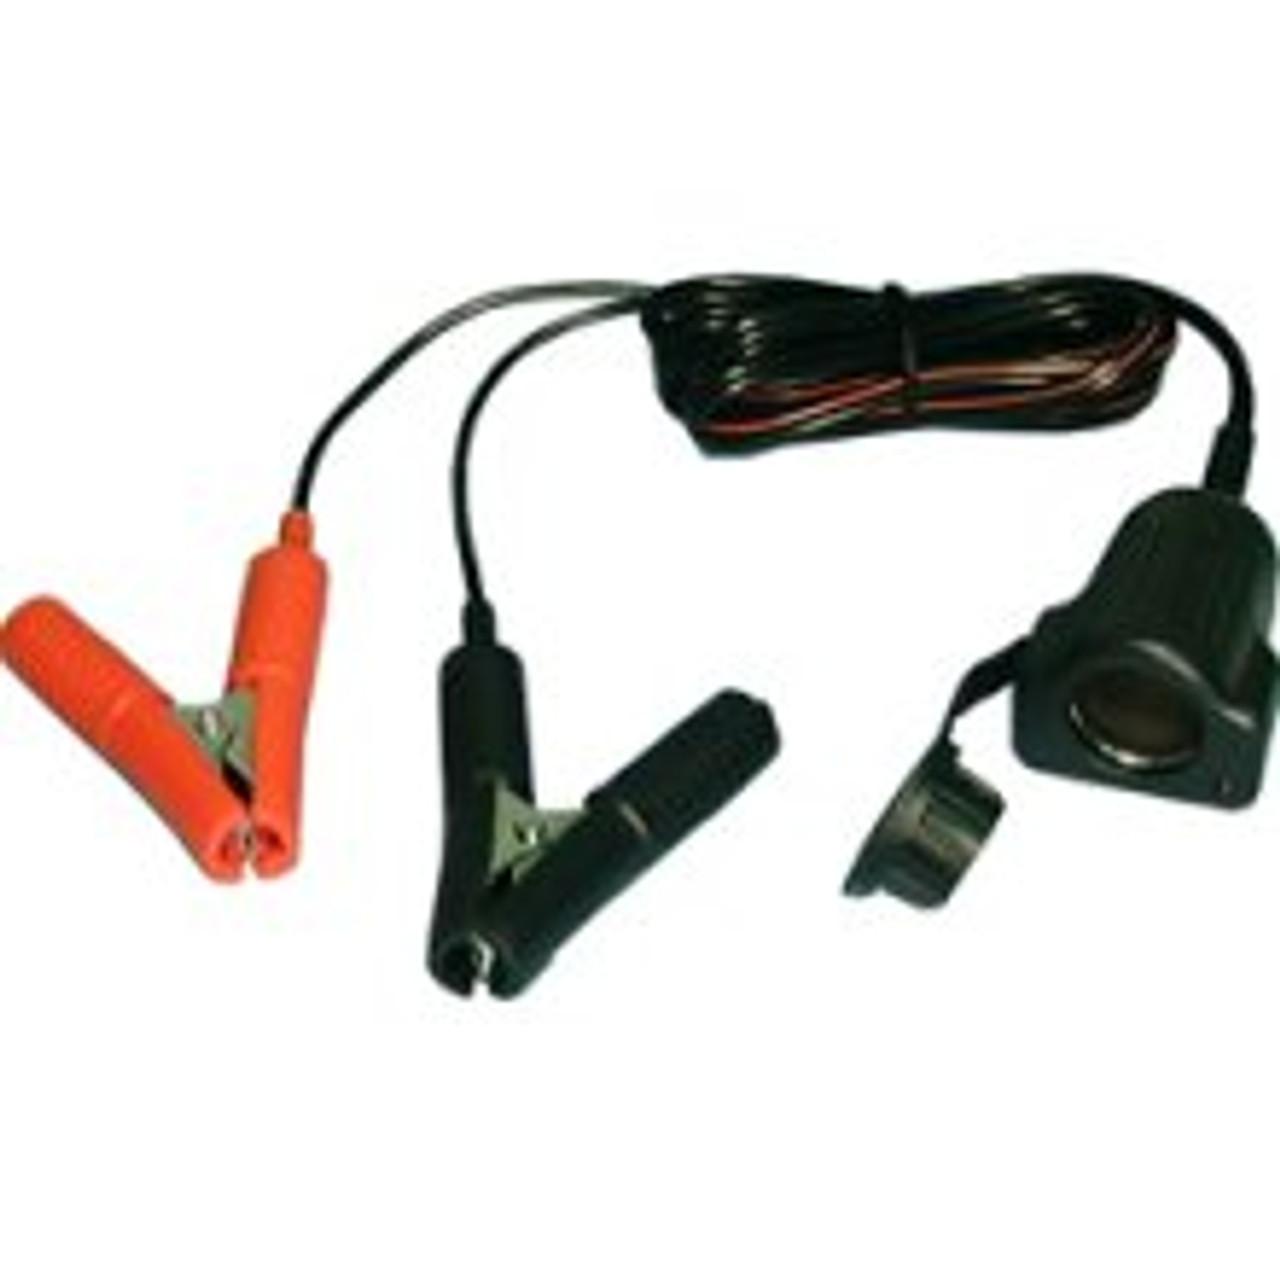 Auto Battery POwer Cord